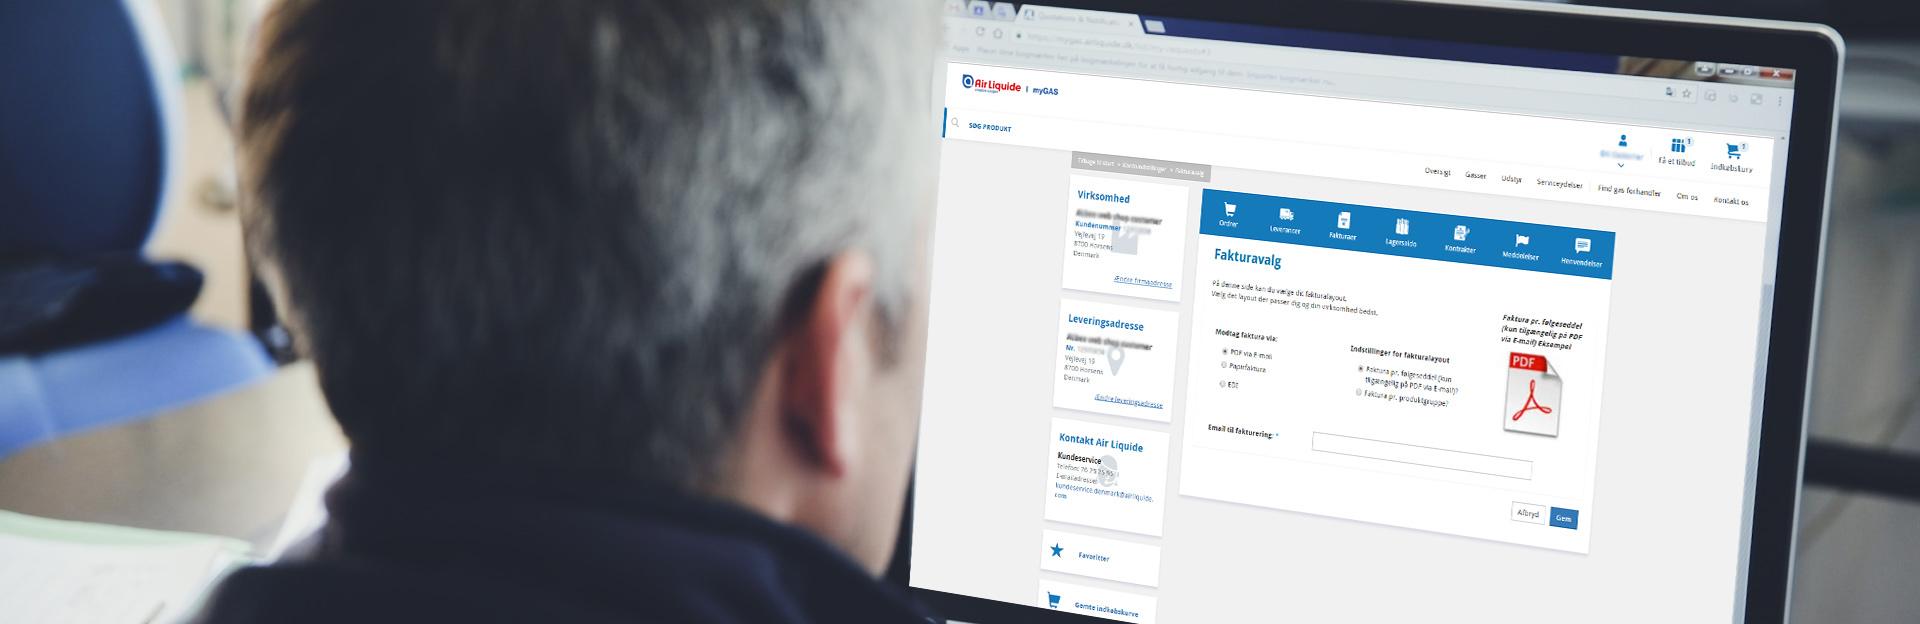 Sähköpostilaskutus |myGAS | Air Liquide